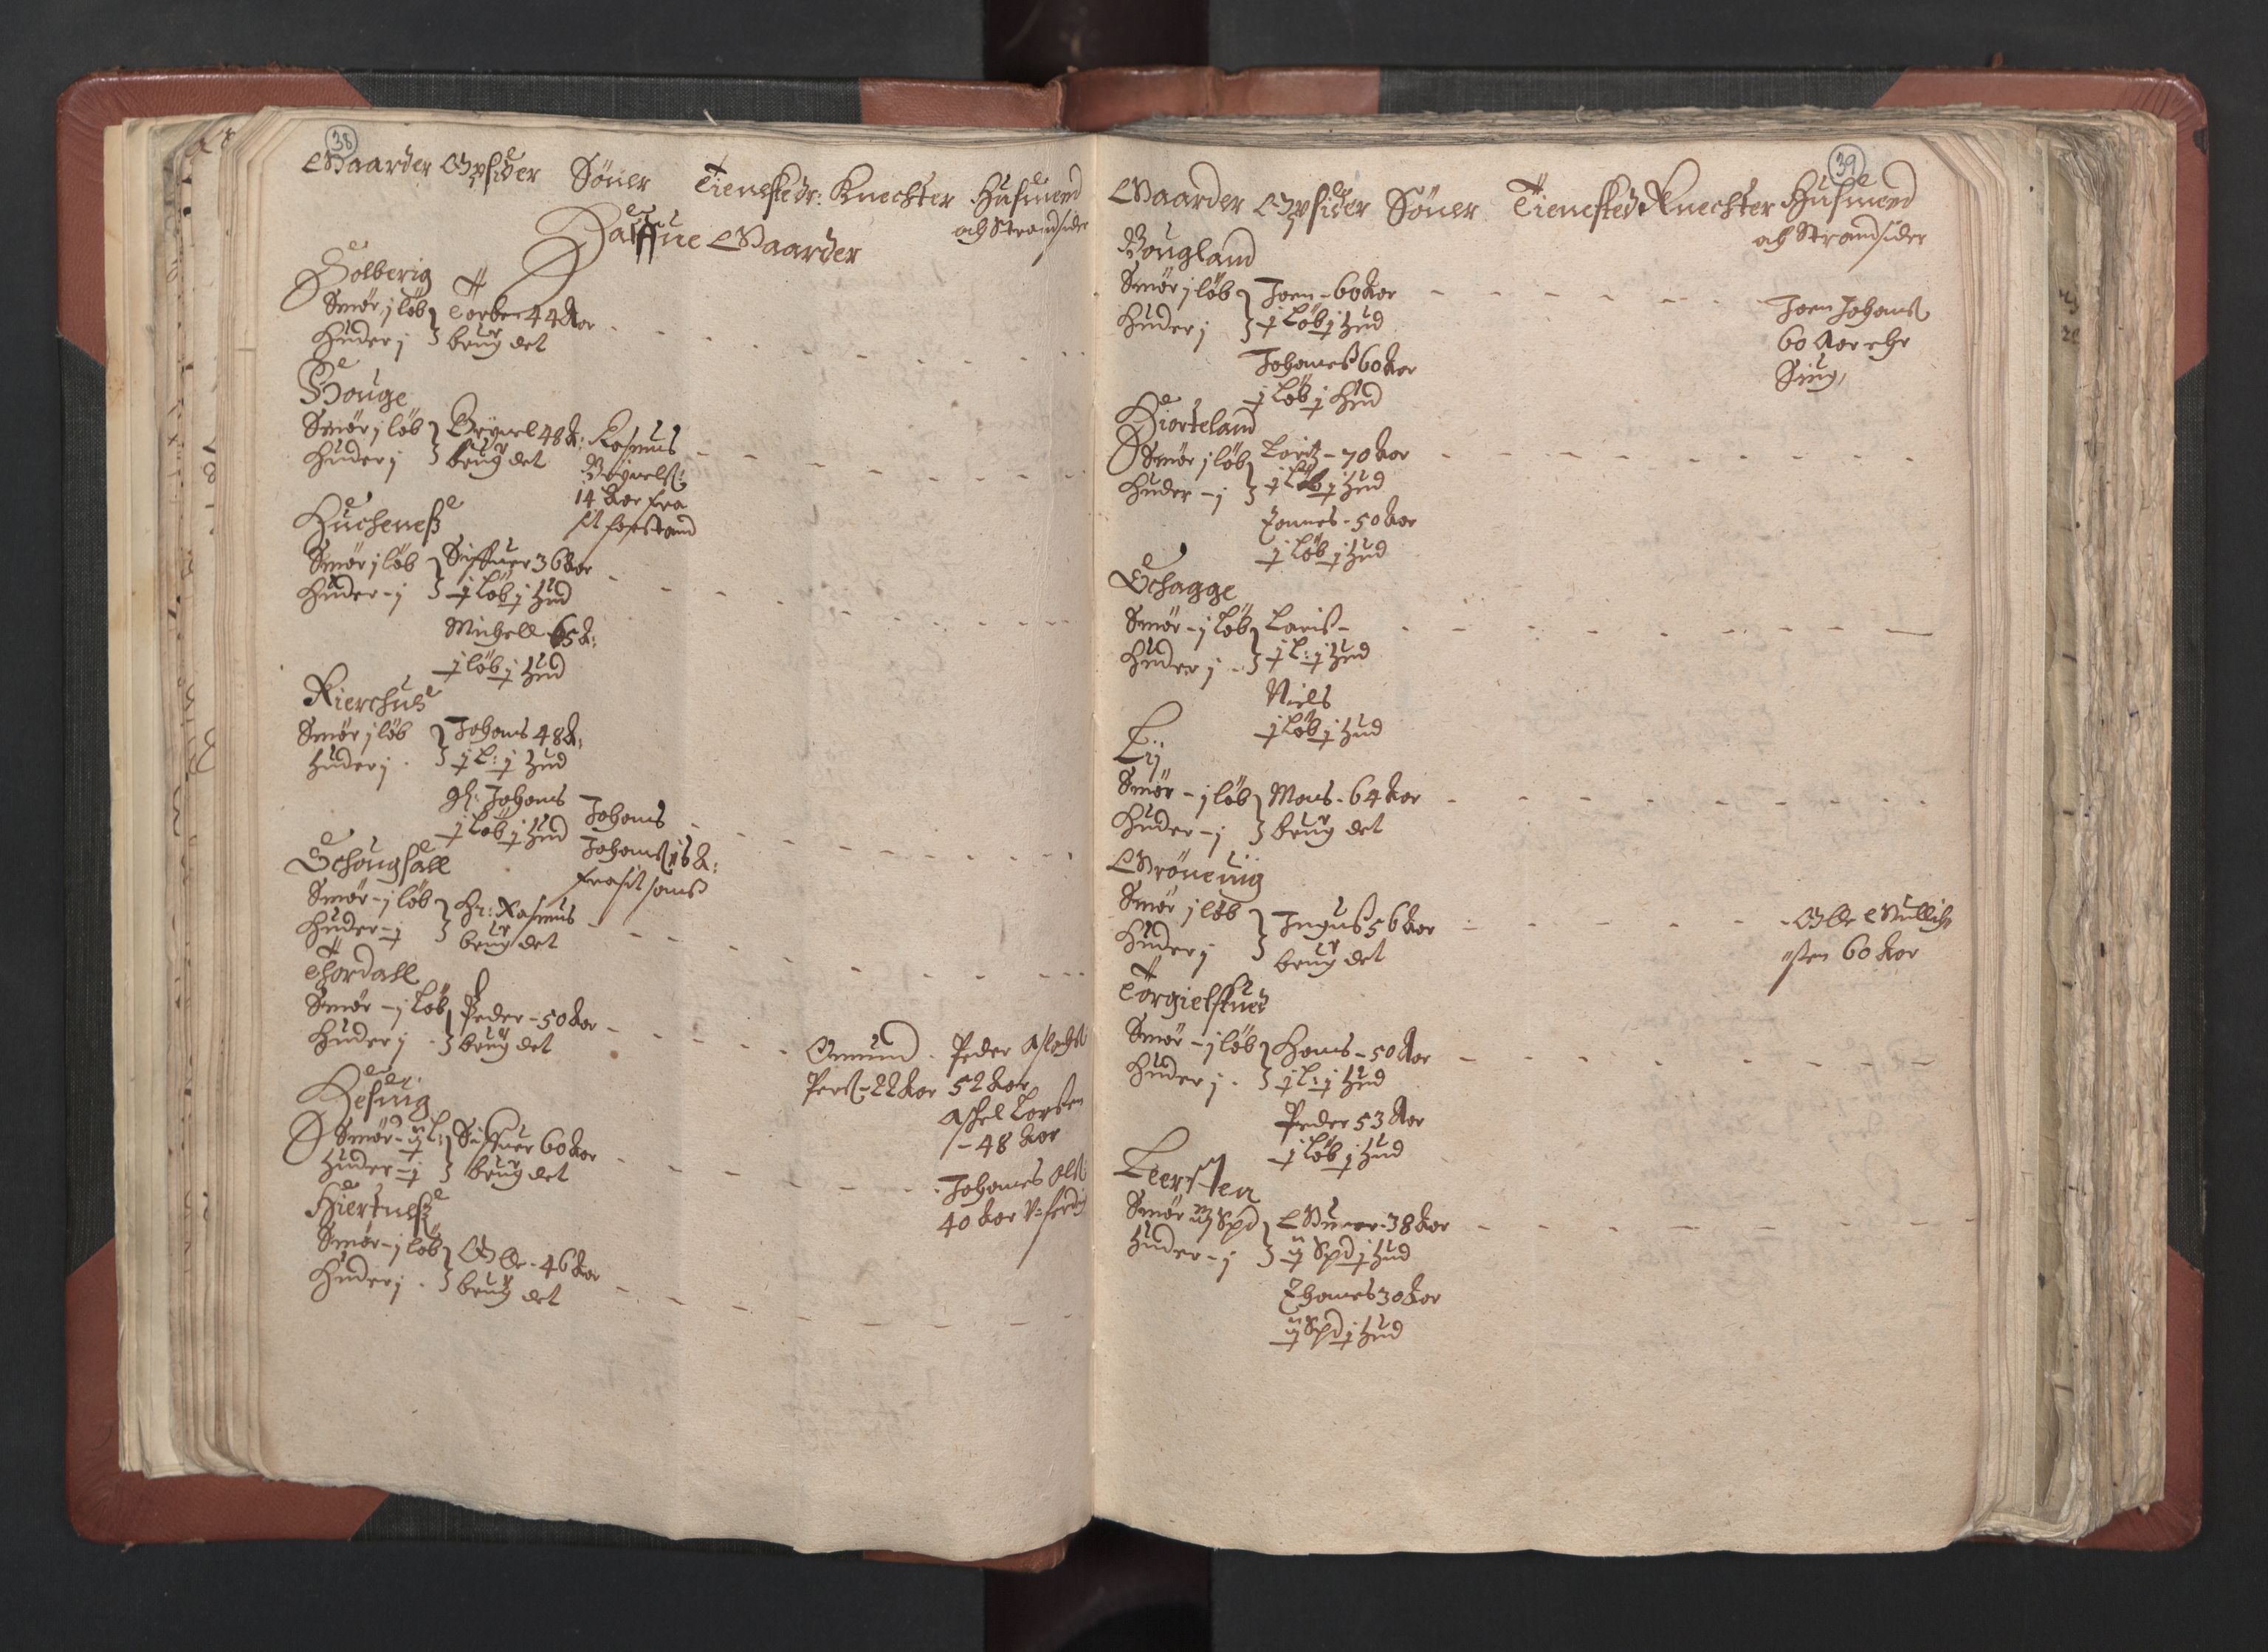 RA, Fogdenes og sorenskrivernes manntall 1664-1666, nr. 13: Nordhordland fogderi og Sunnhordland fogderi, 1665, s. 38-39